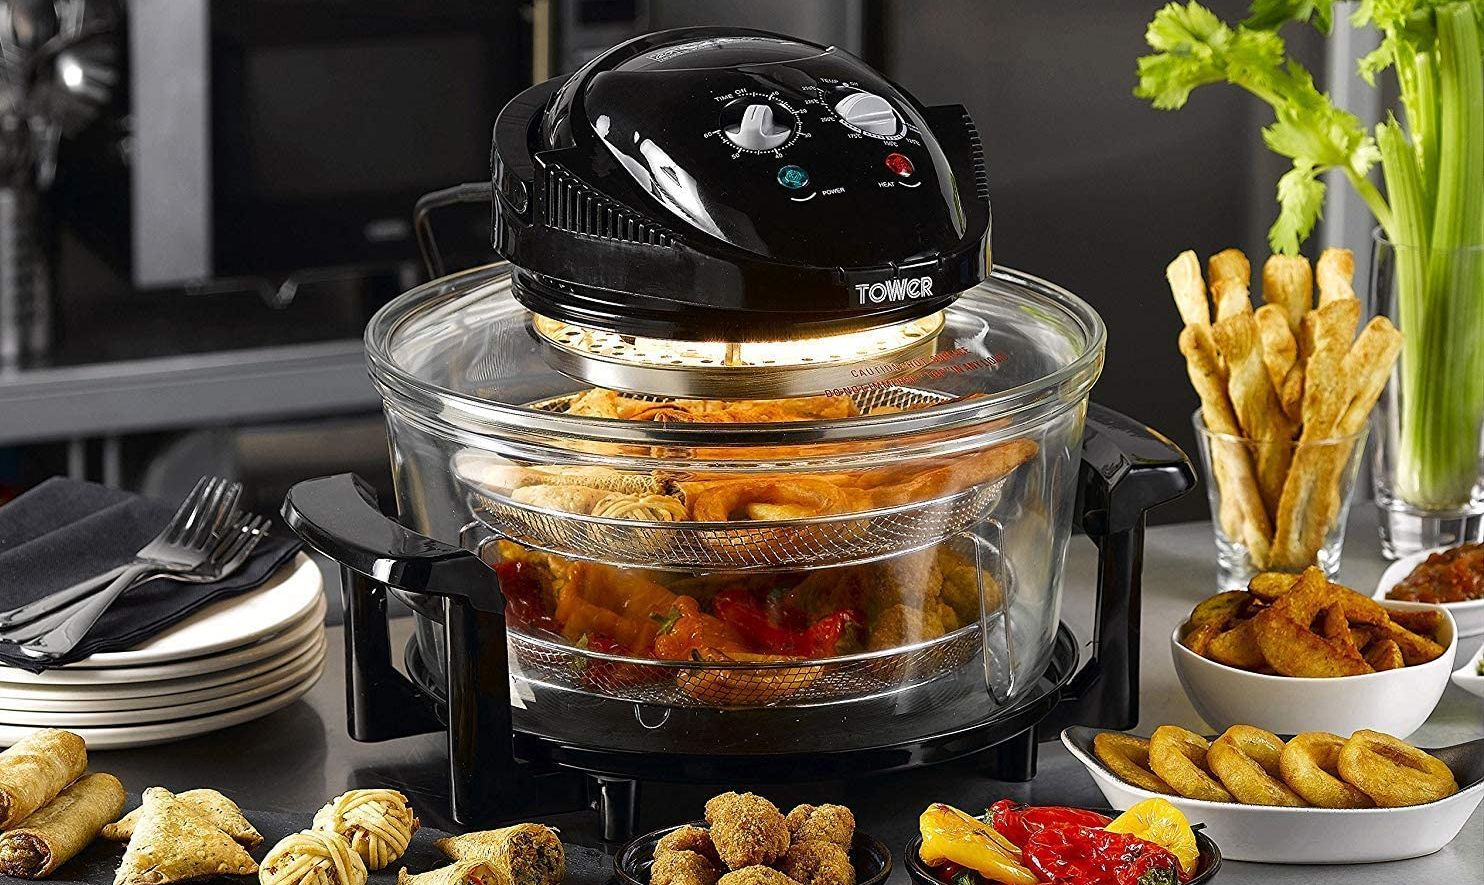 5L Capacity Electric 17L Halogen Air Fryer Low Fat Fast Cook Healthy Oven 12L